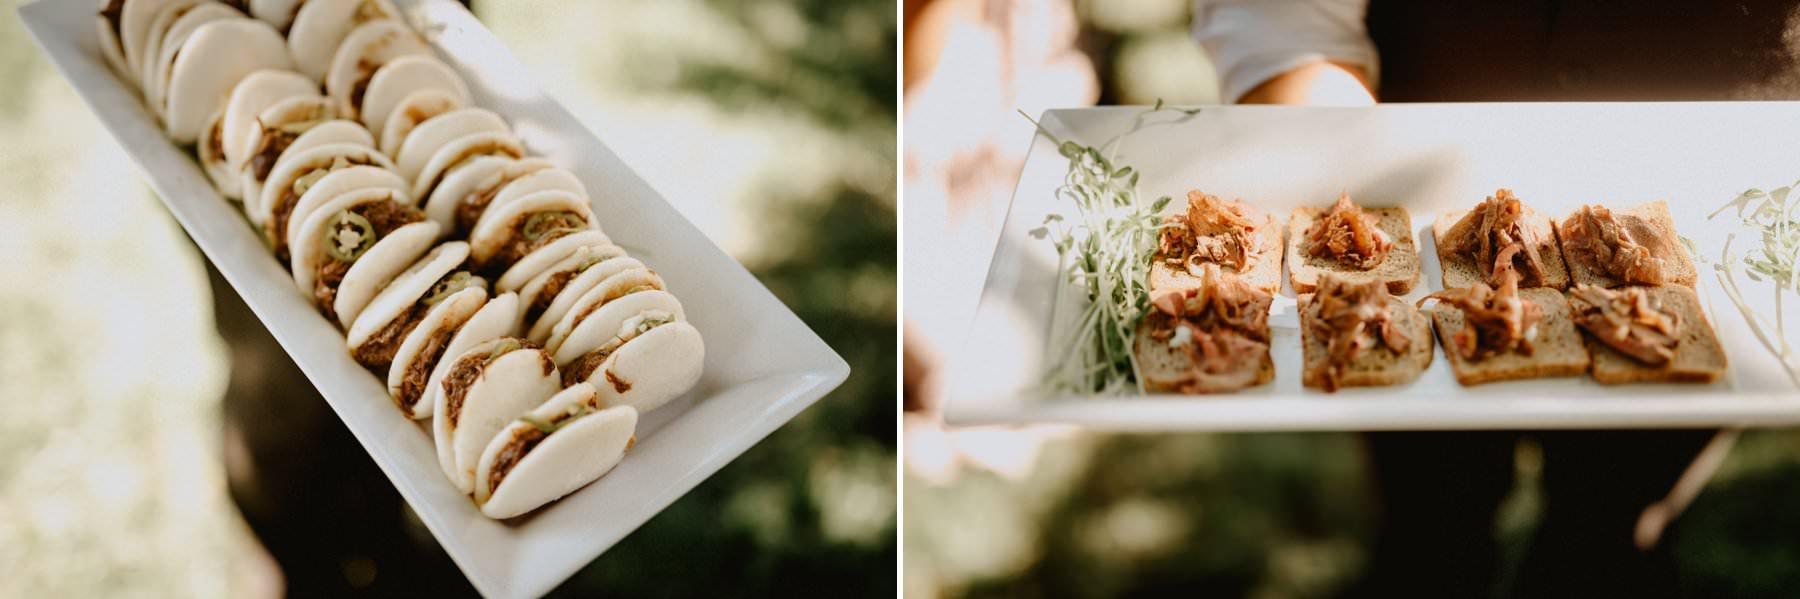 Appleford-estate-wedding-108.jpg